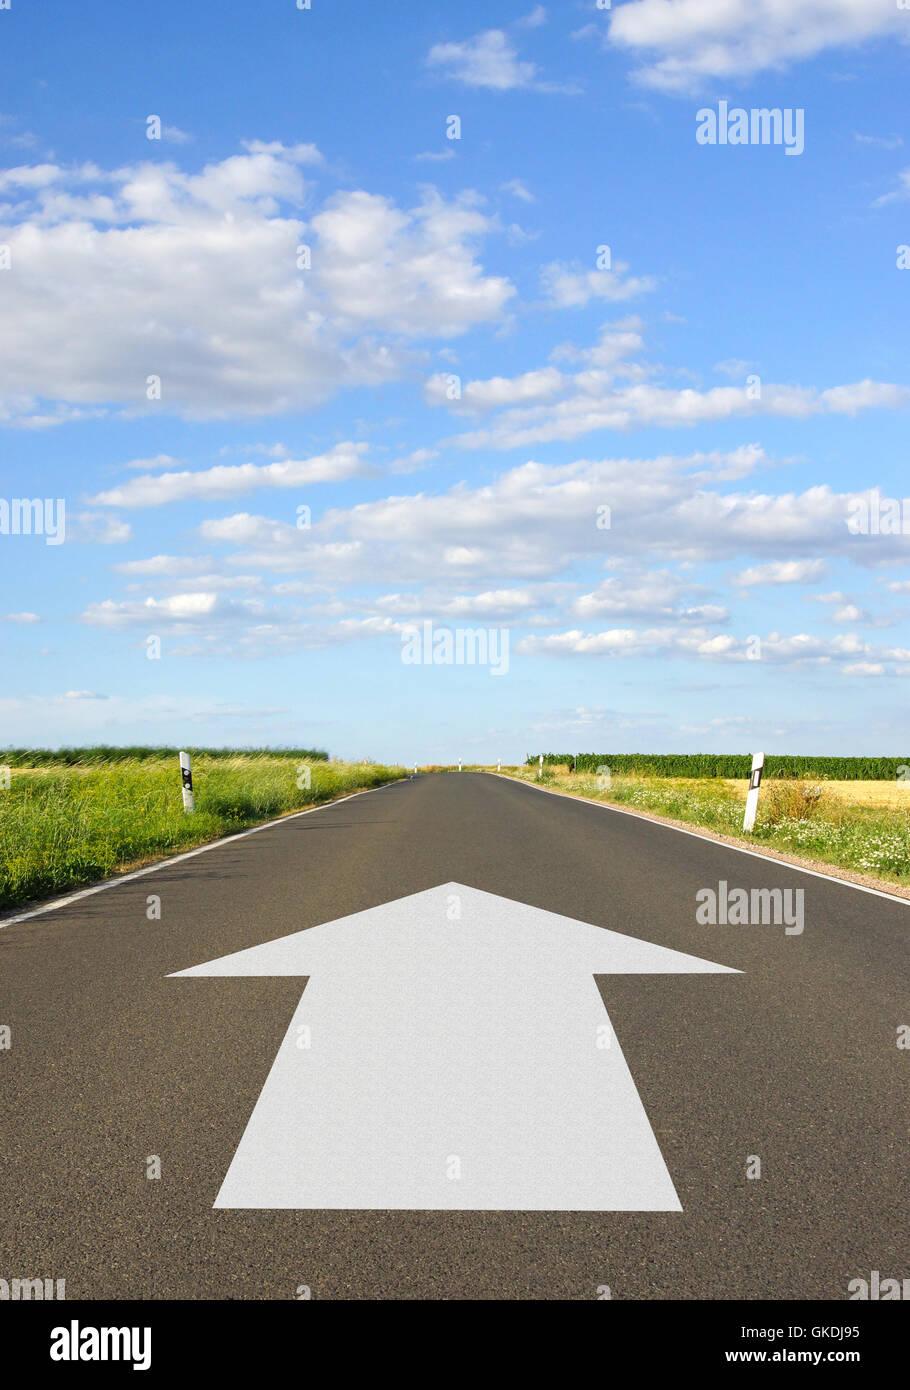 future direction aim - Stock Image